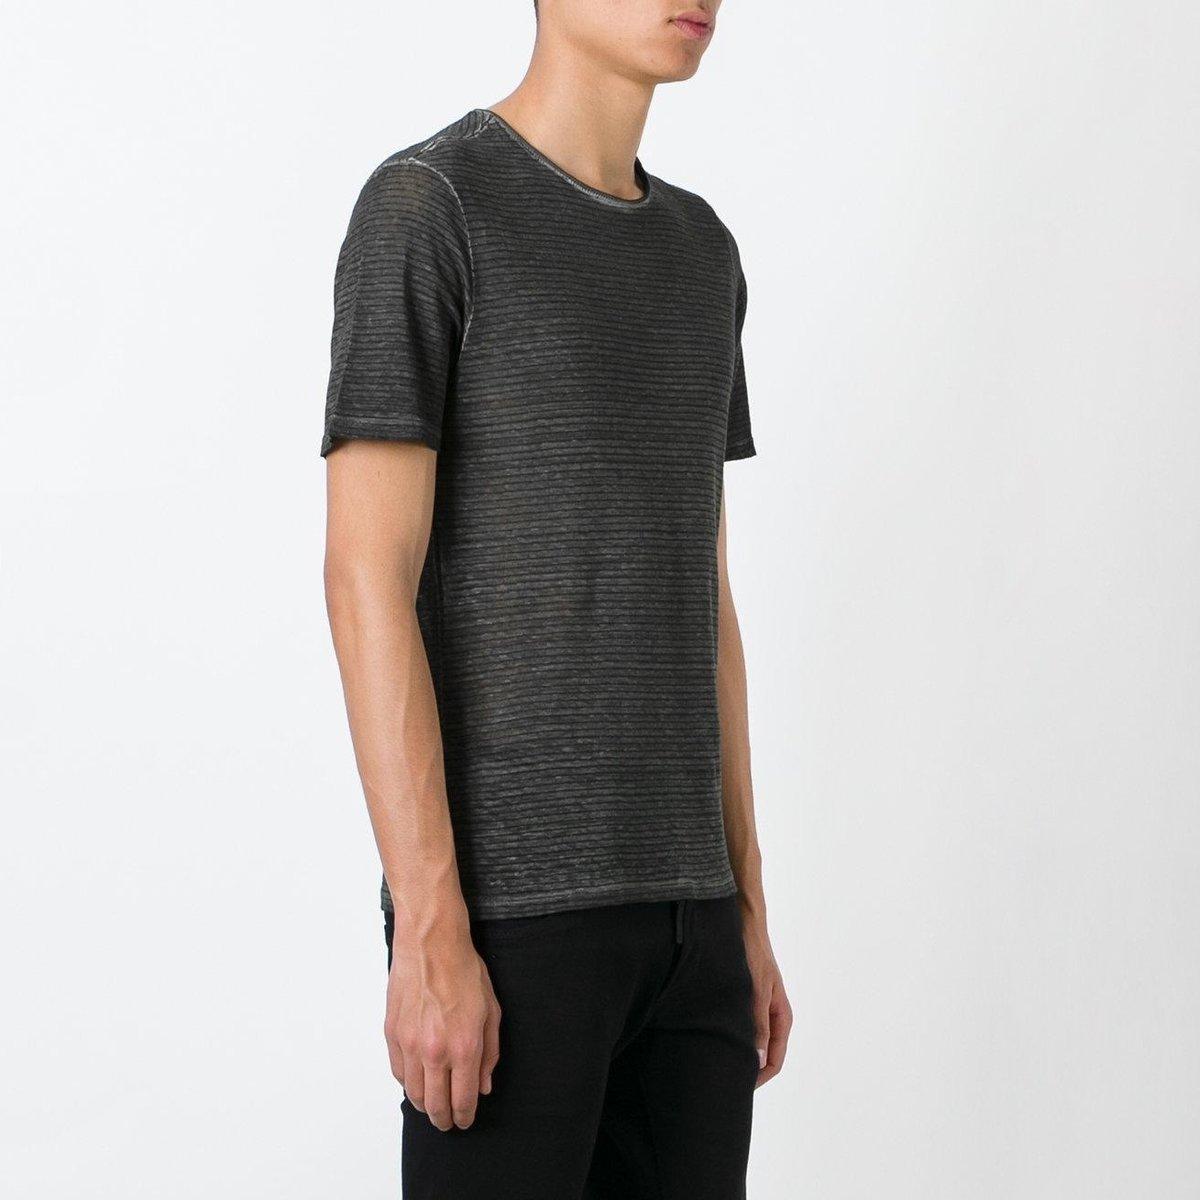 transit-Striped-linen-T-shirt (2).jpg